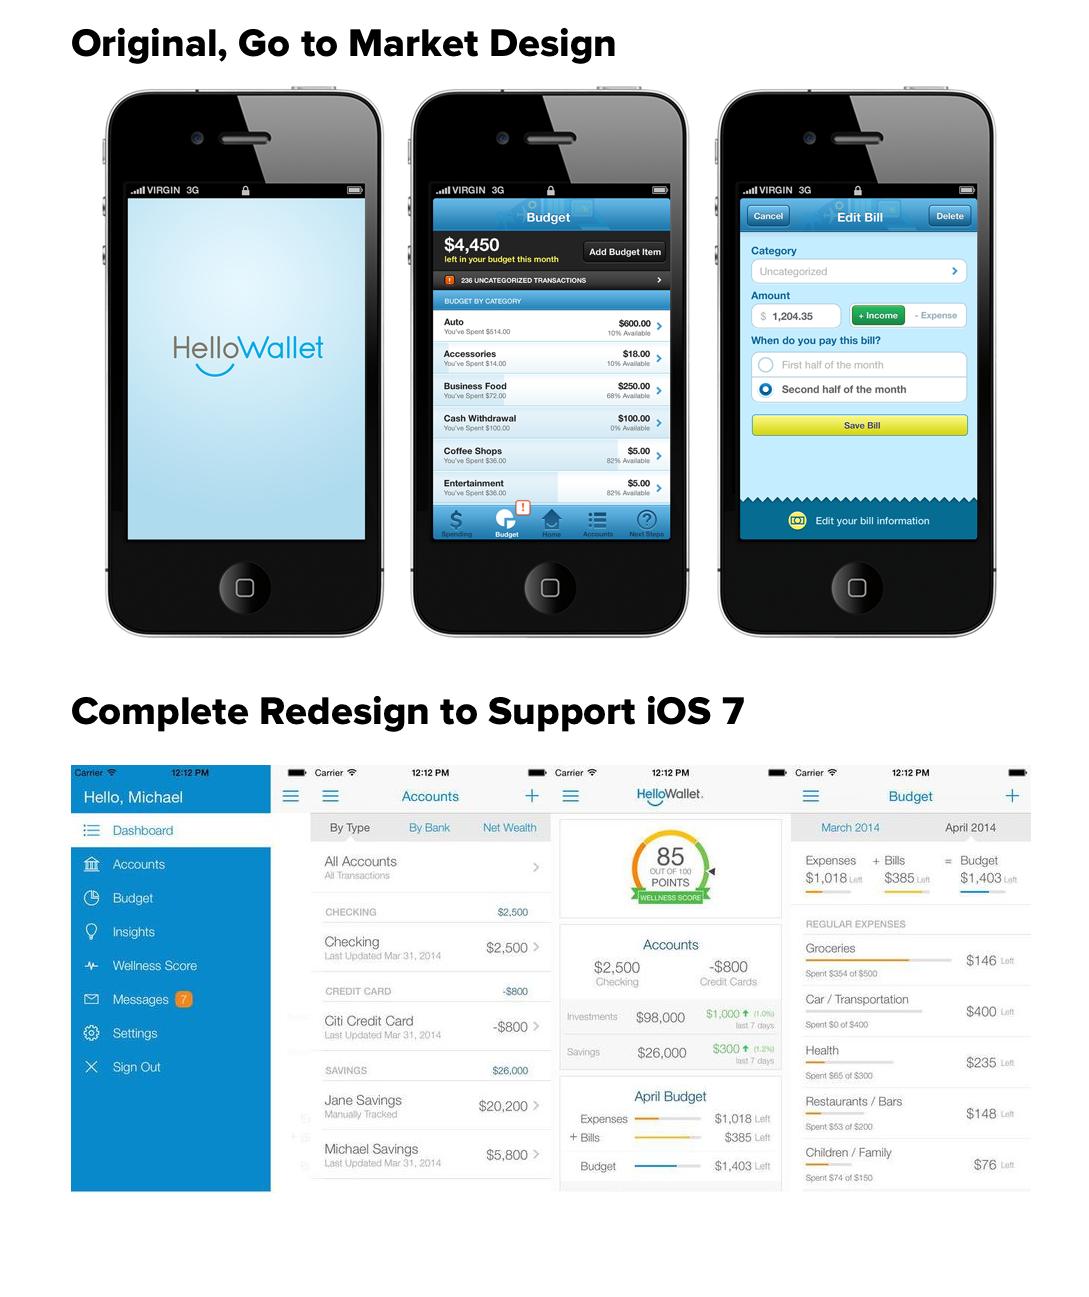 ios7 redesign comparison.png